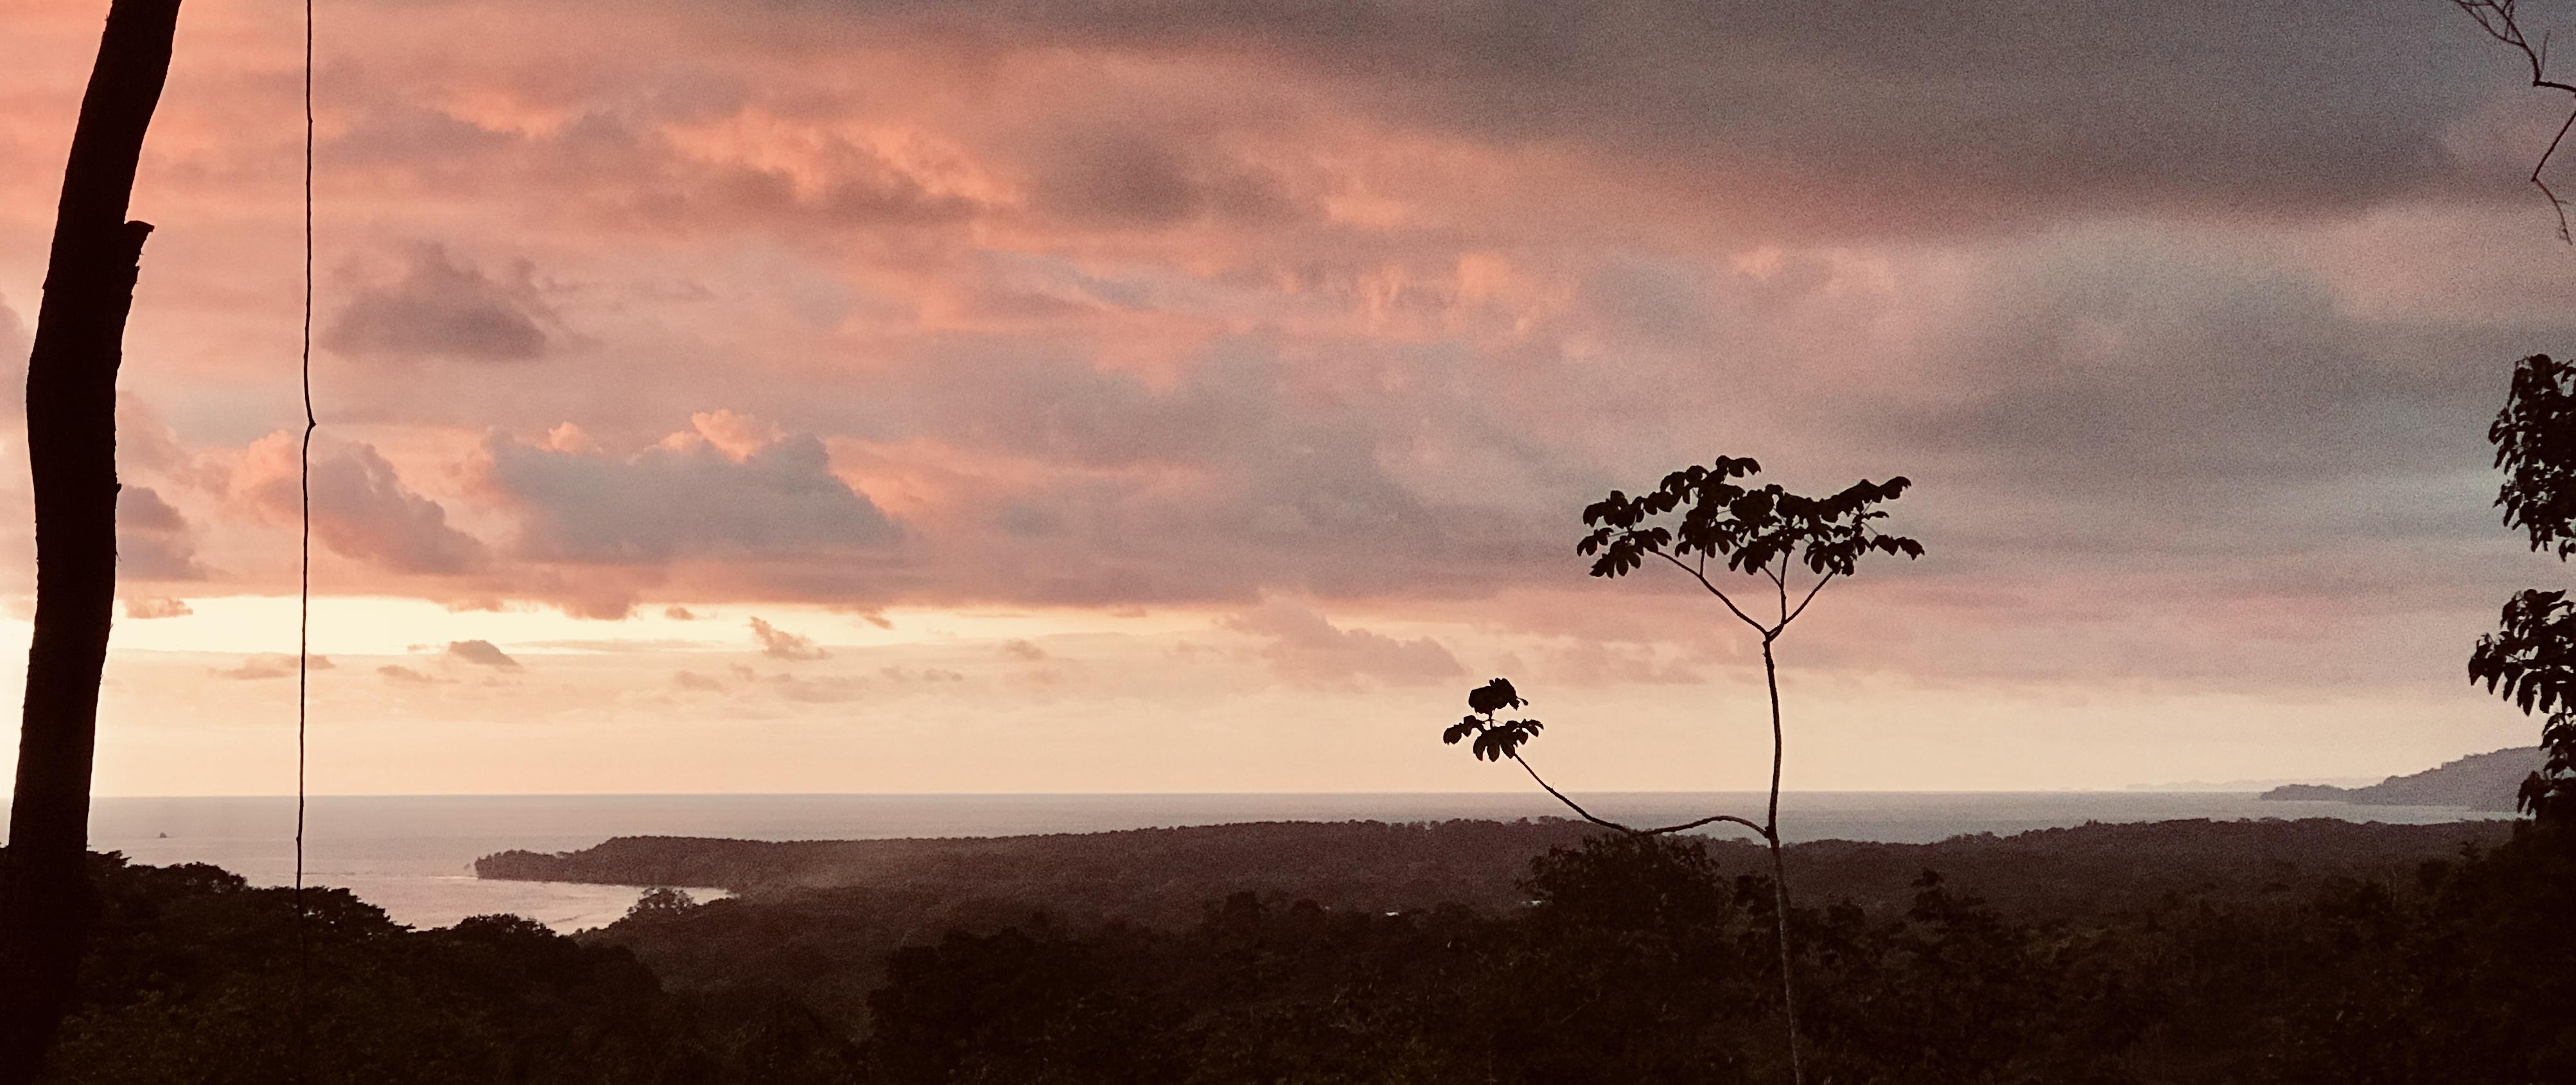 sunset dulce pacifico uvita costa rica residencial development